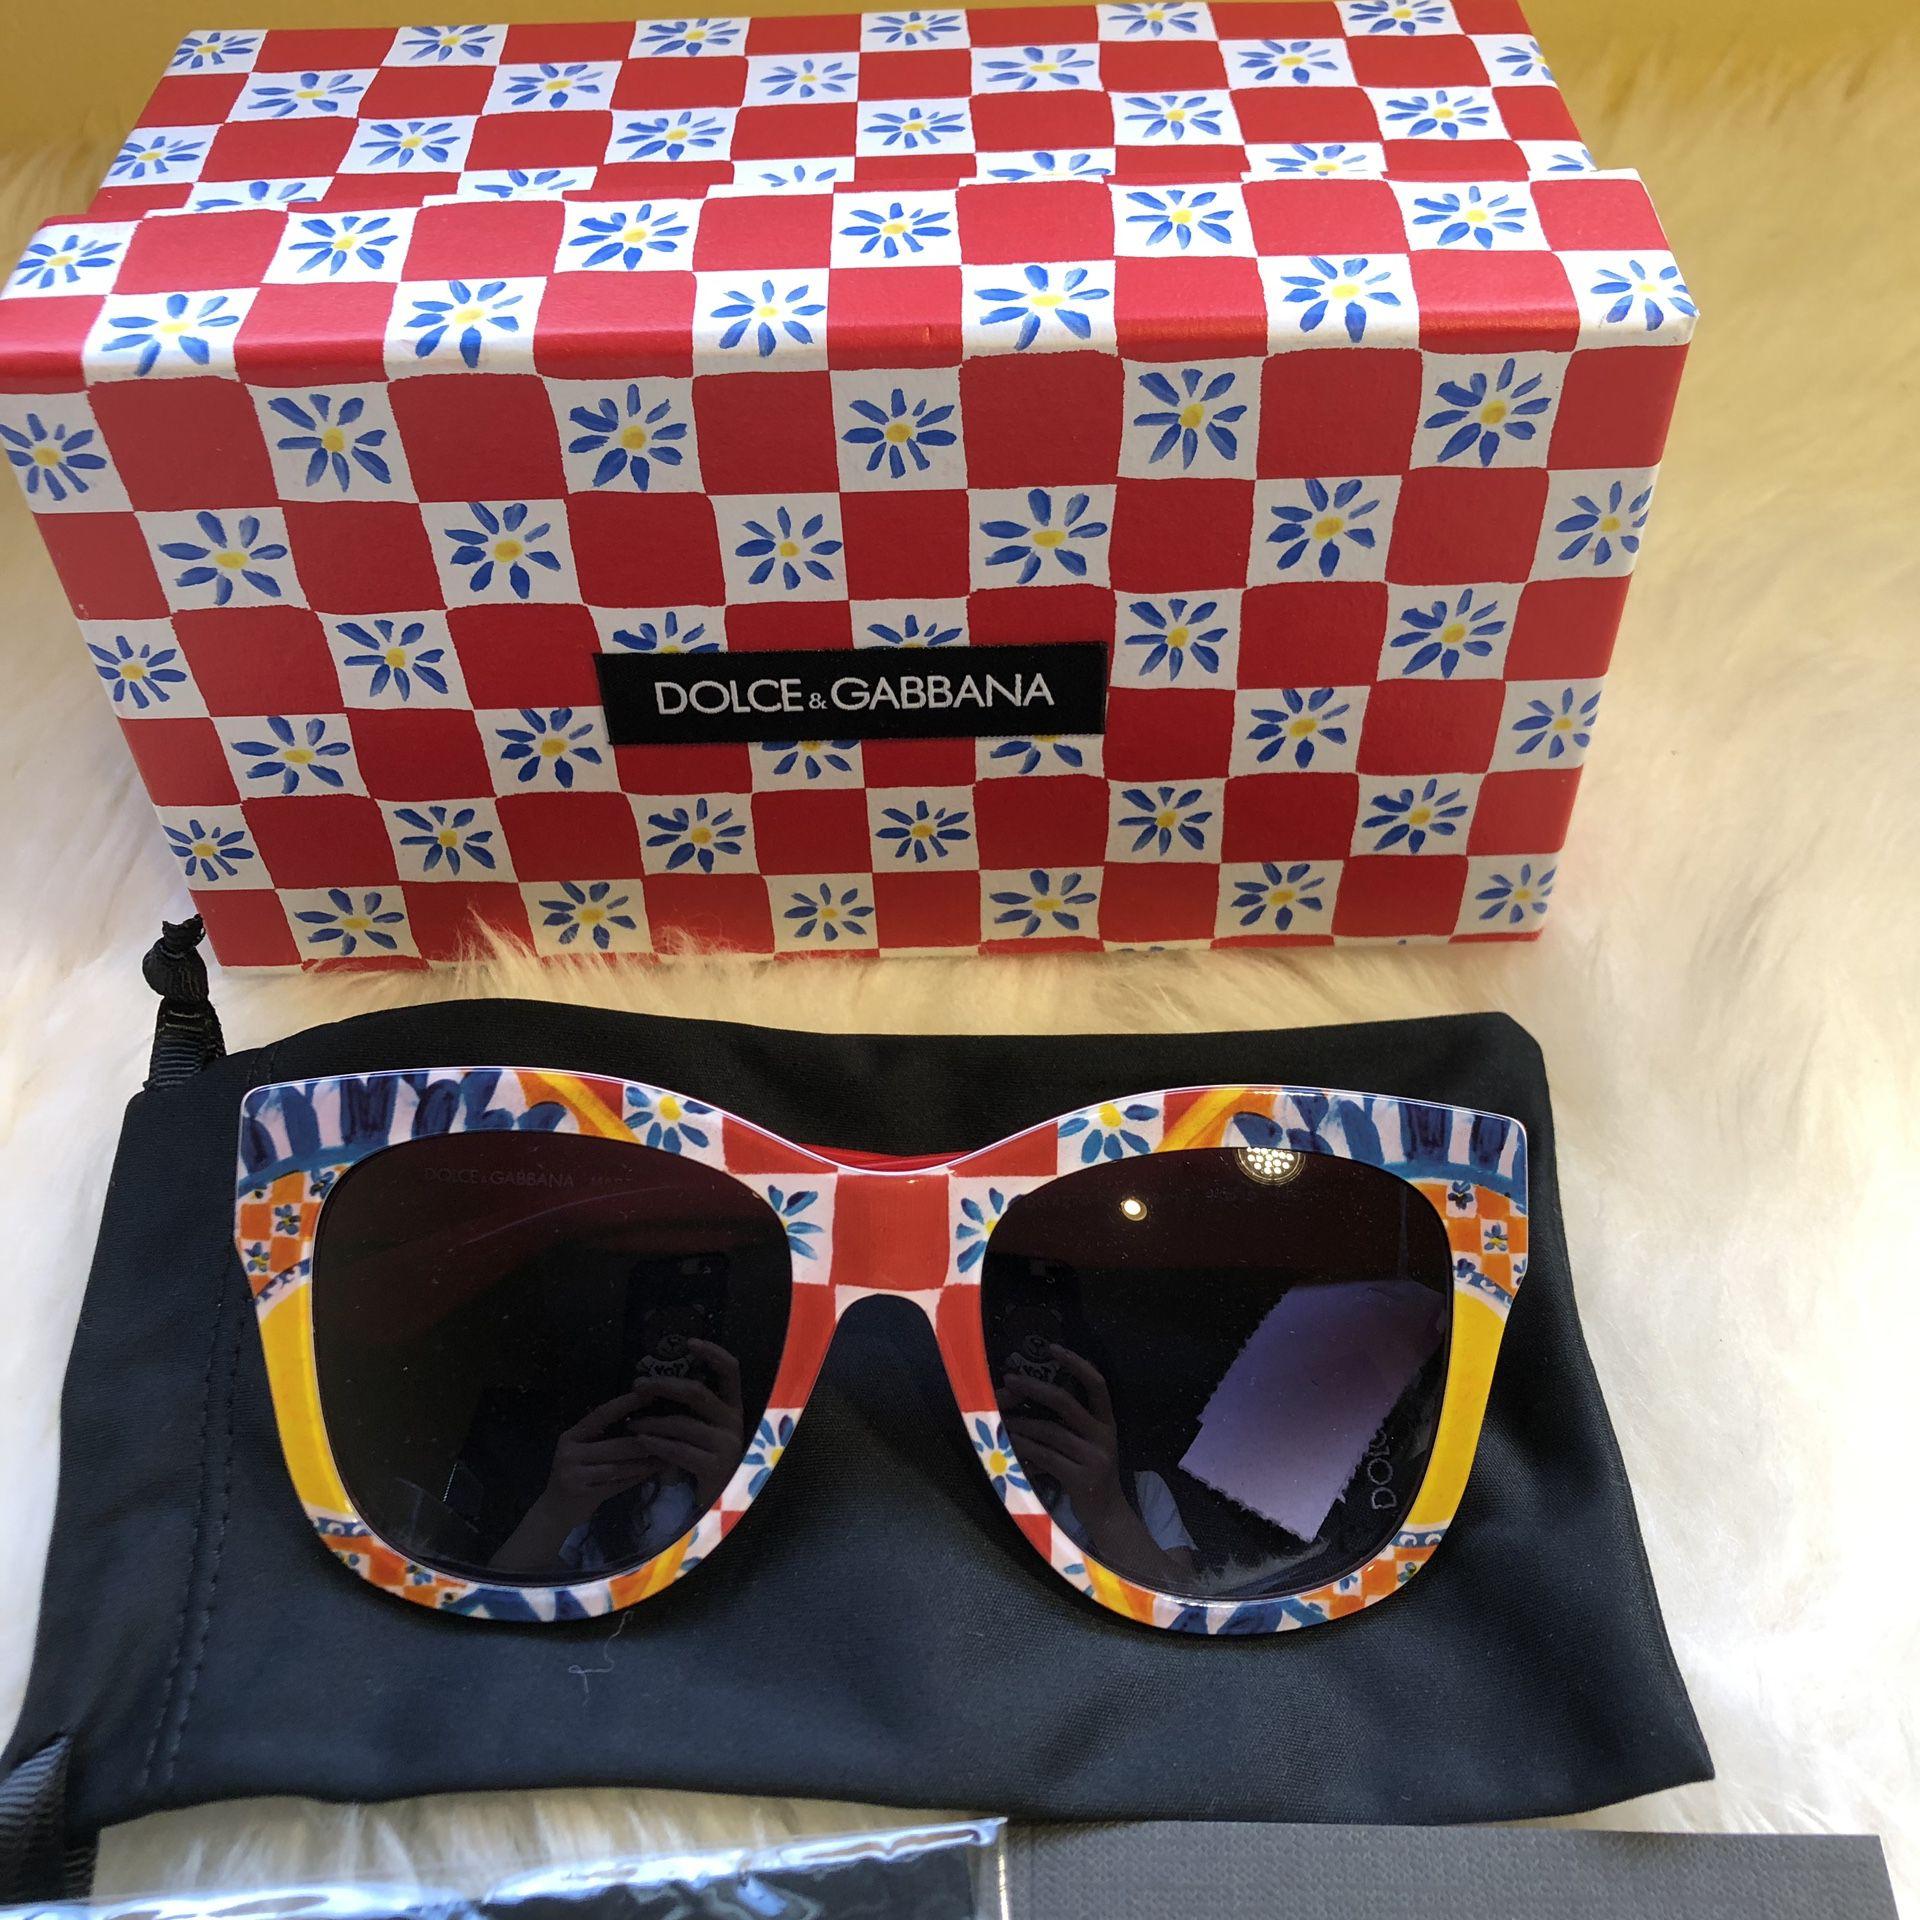 New authentic Dolce&Gabbana Sunglasses